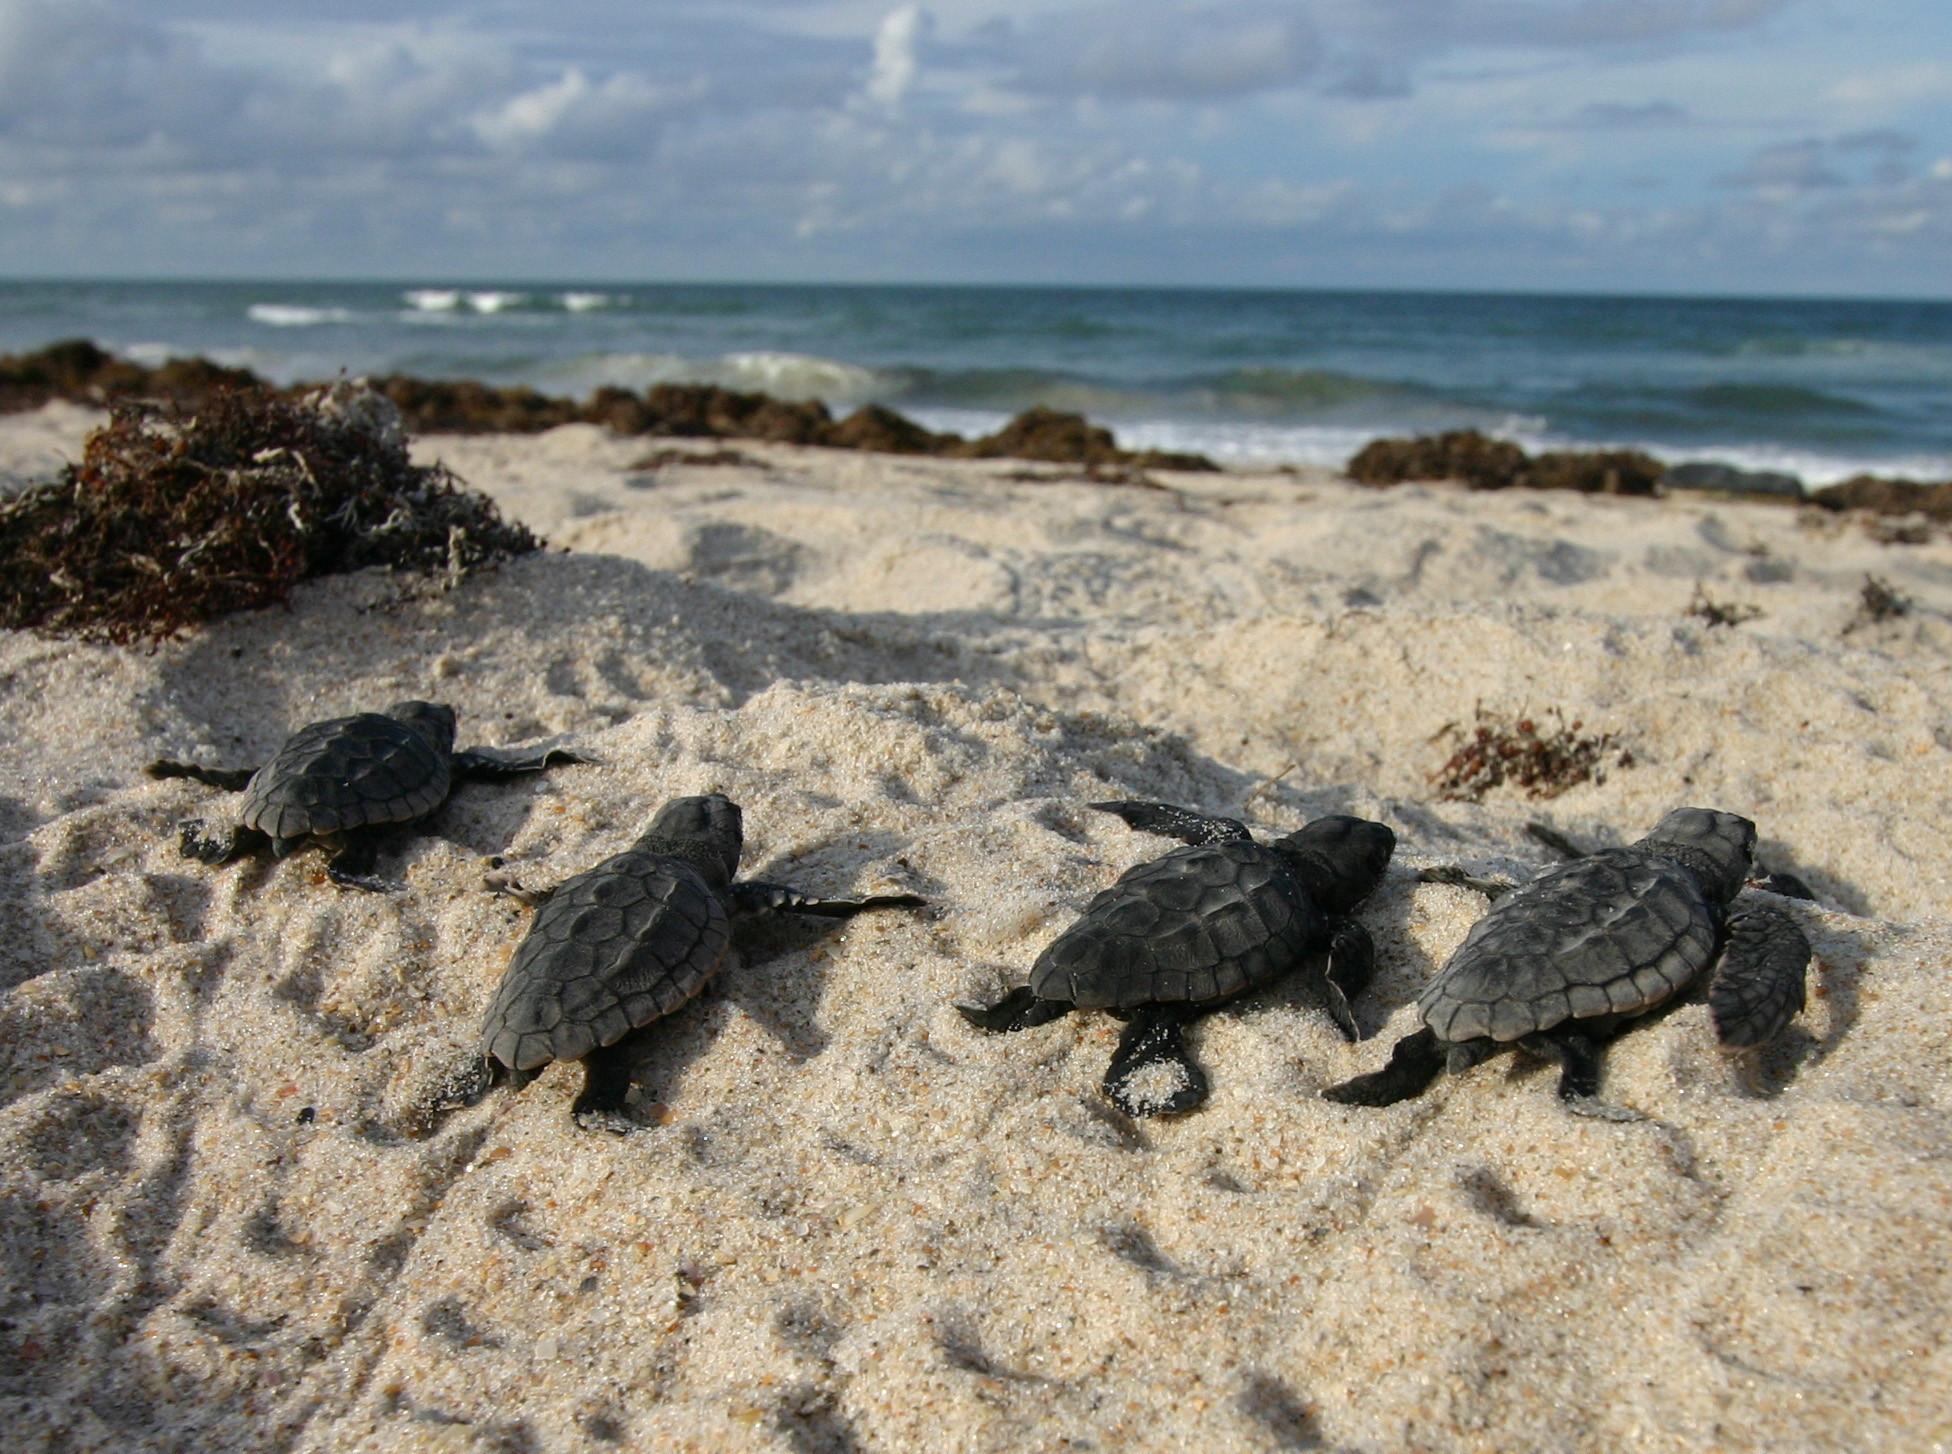 Sea Turtles in Georgia Sea Turtles Set New Nesting